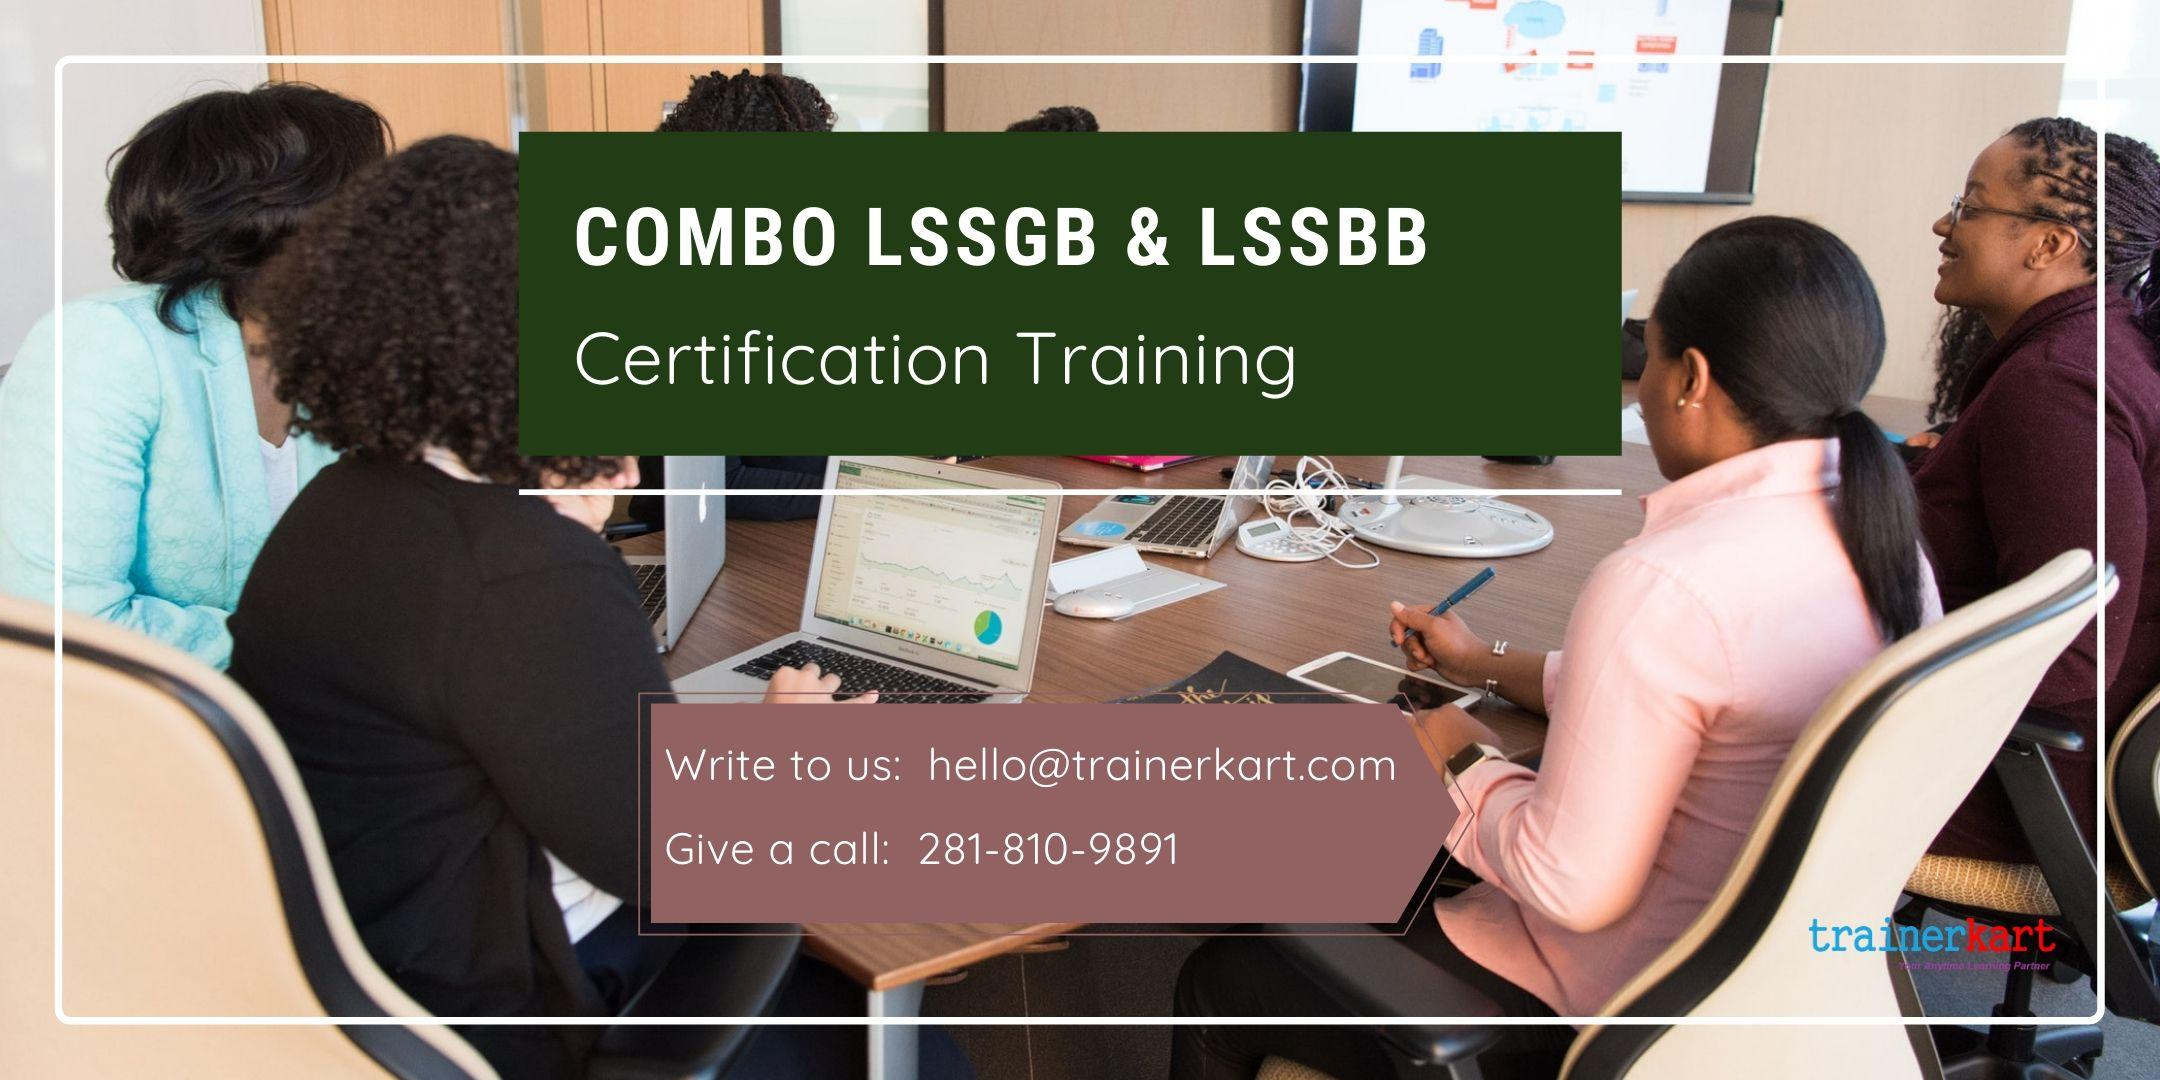 Combo LSSGB & LSSBB 4 day classroom Training in Saint John, NB